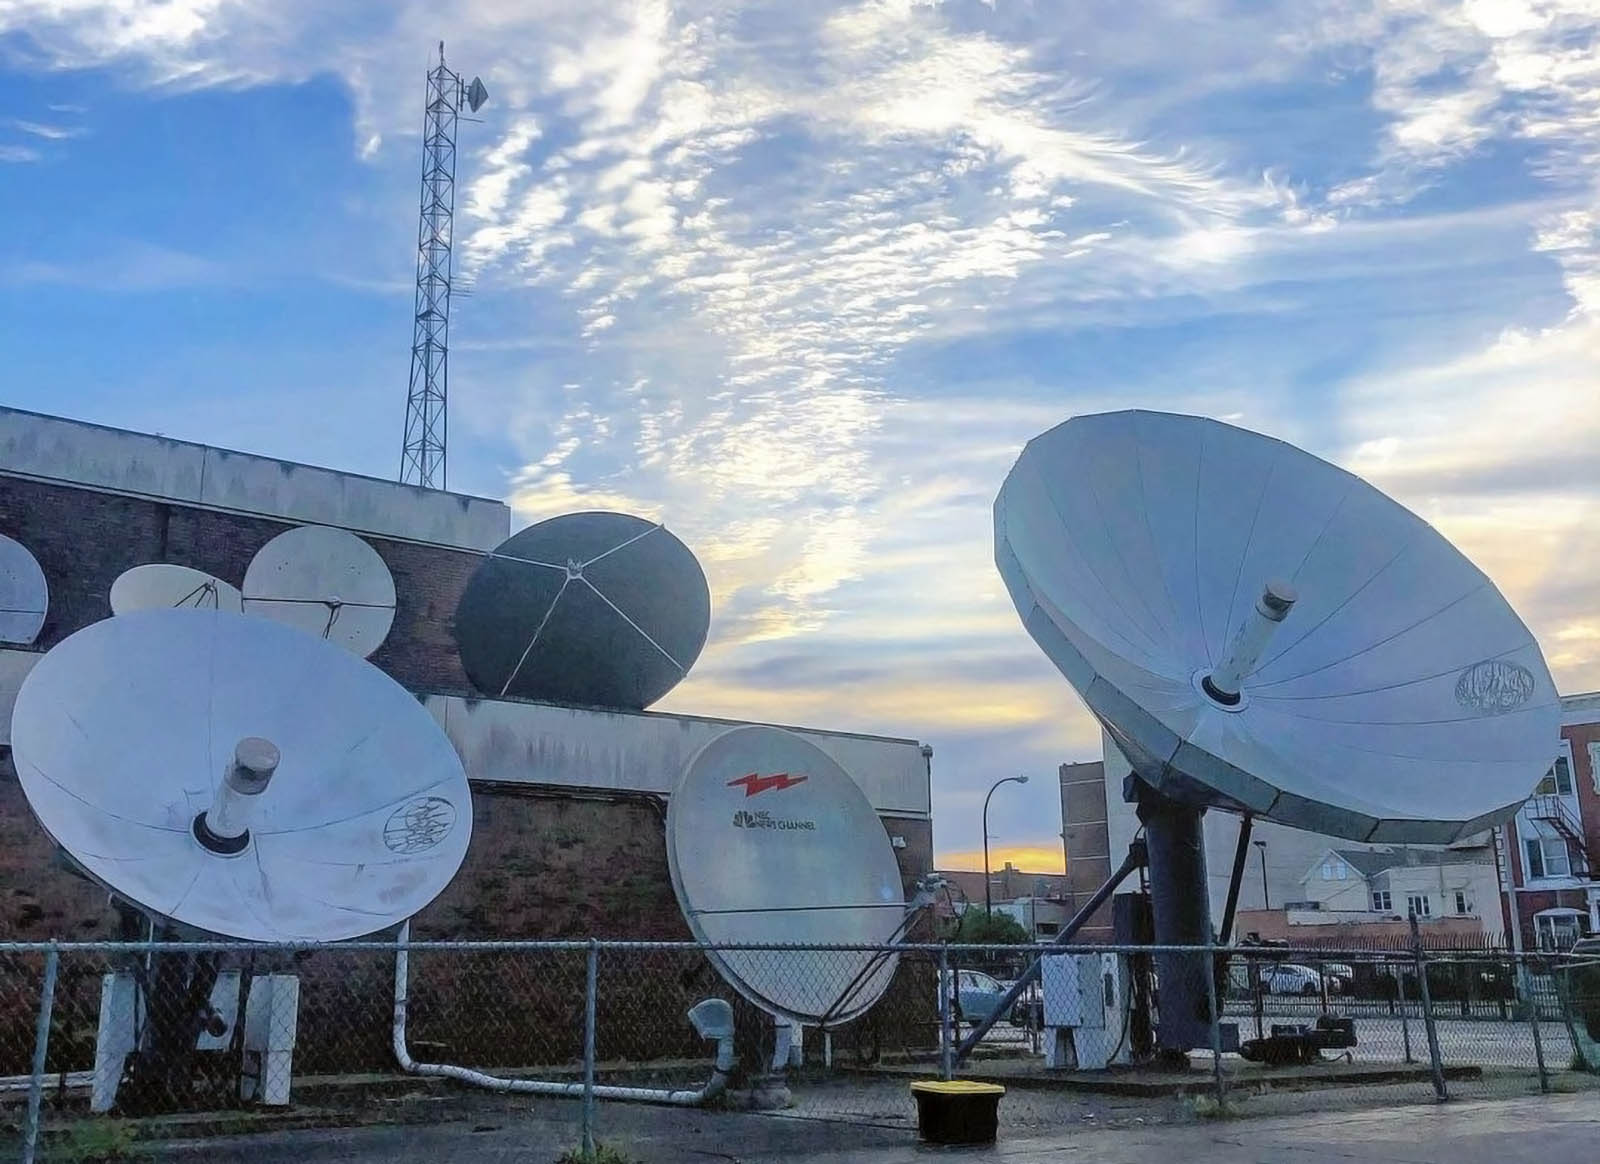 WGRZ News Channel 2 satellite dishes